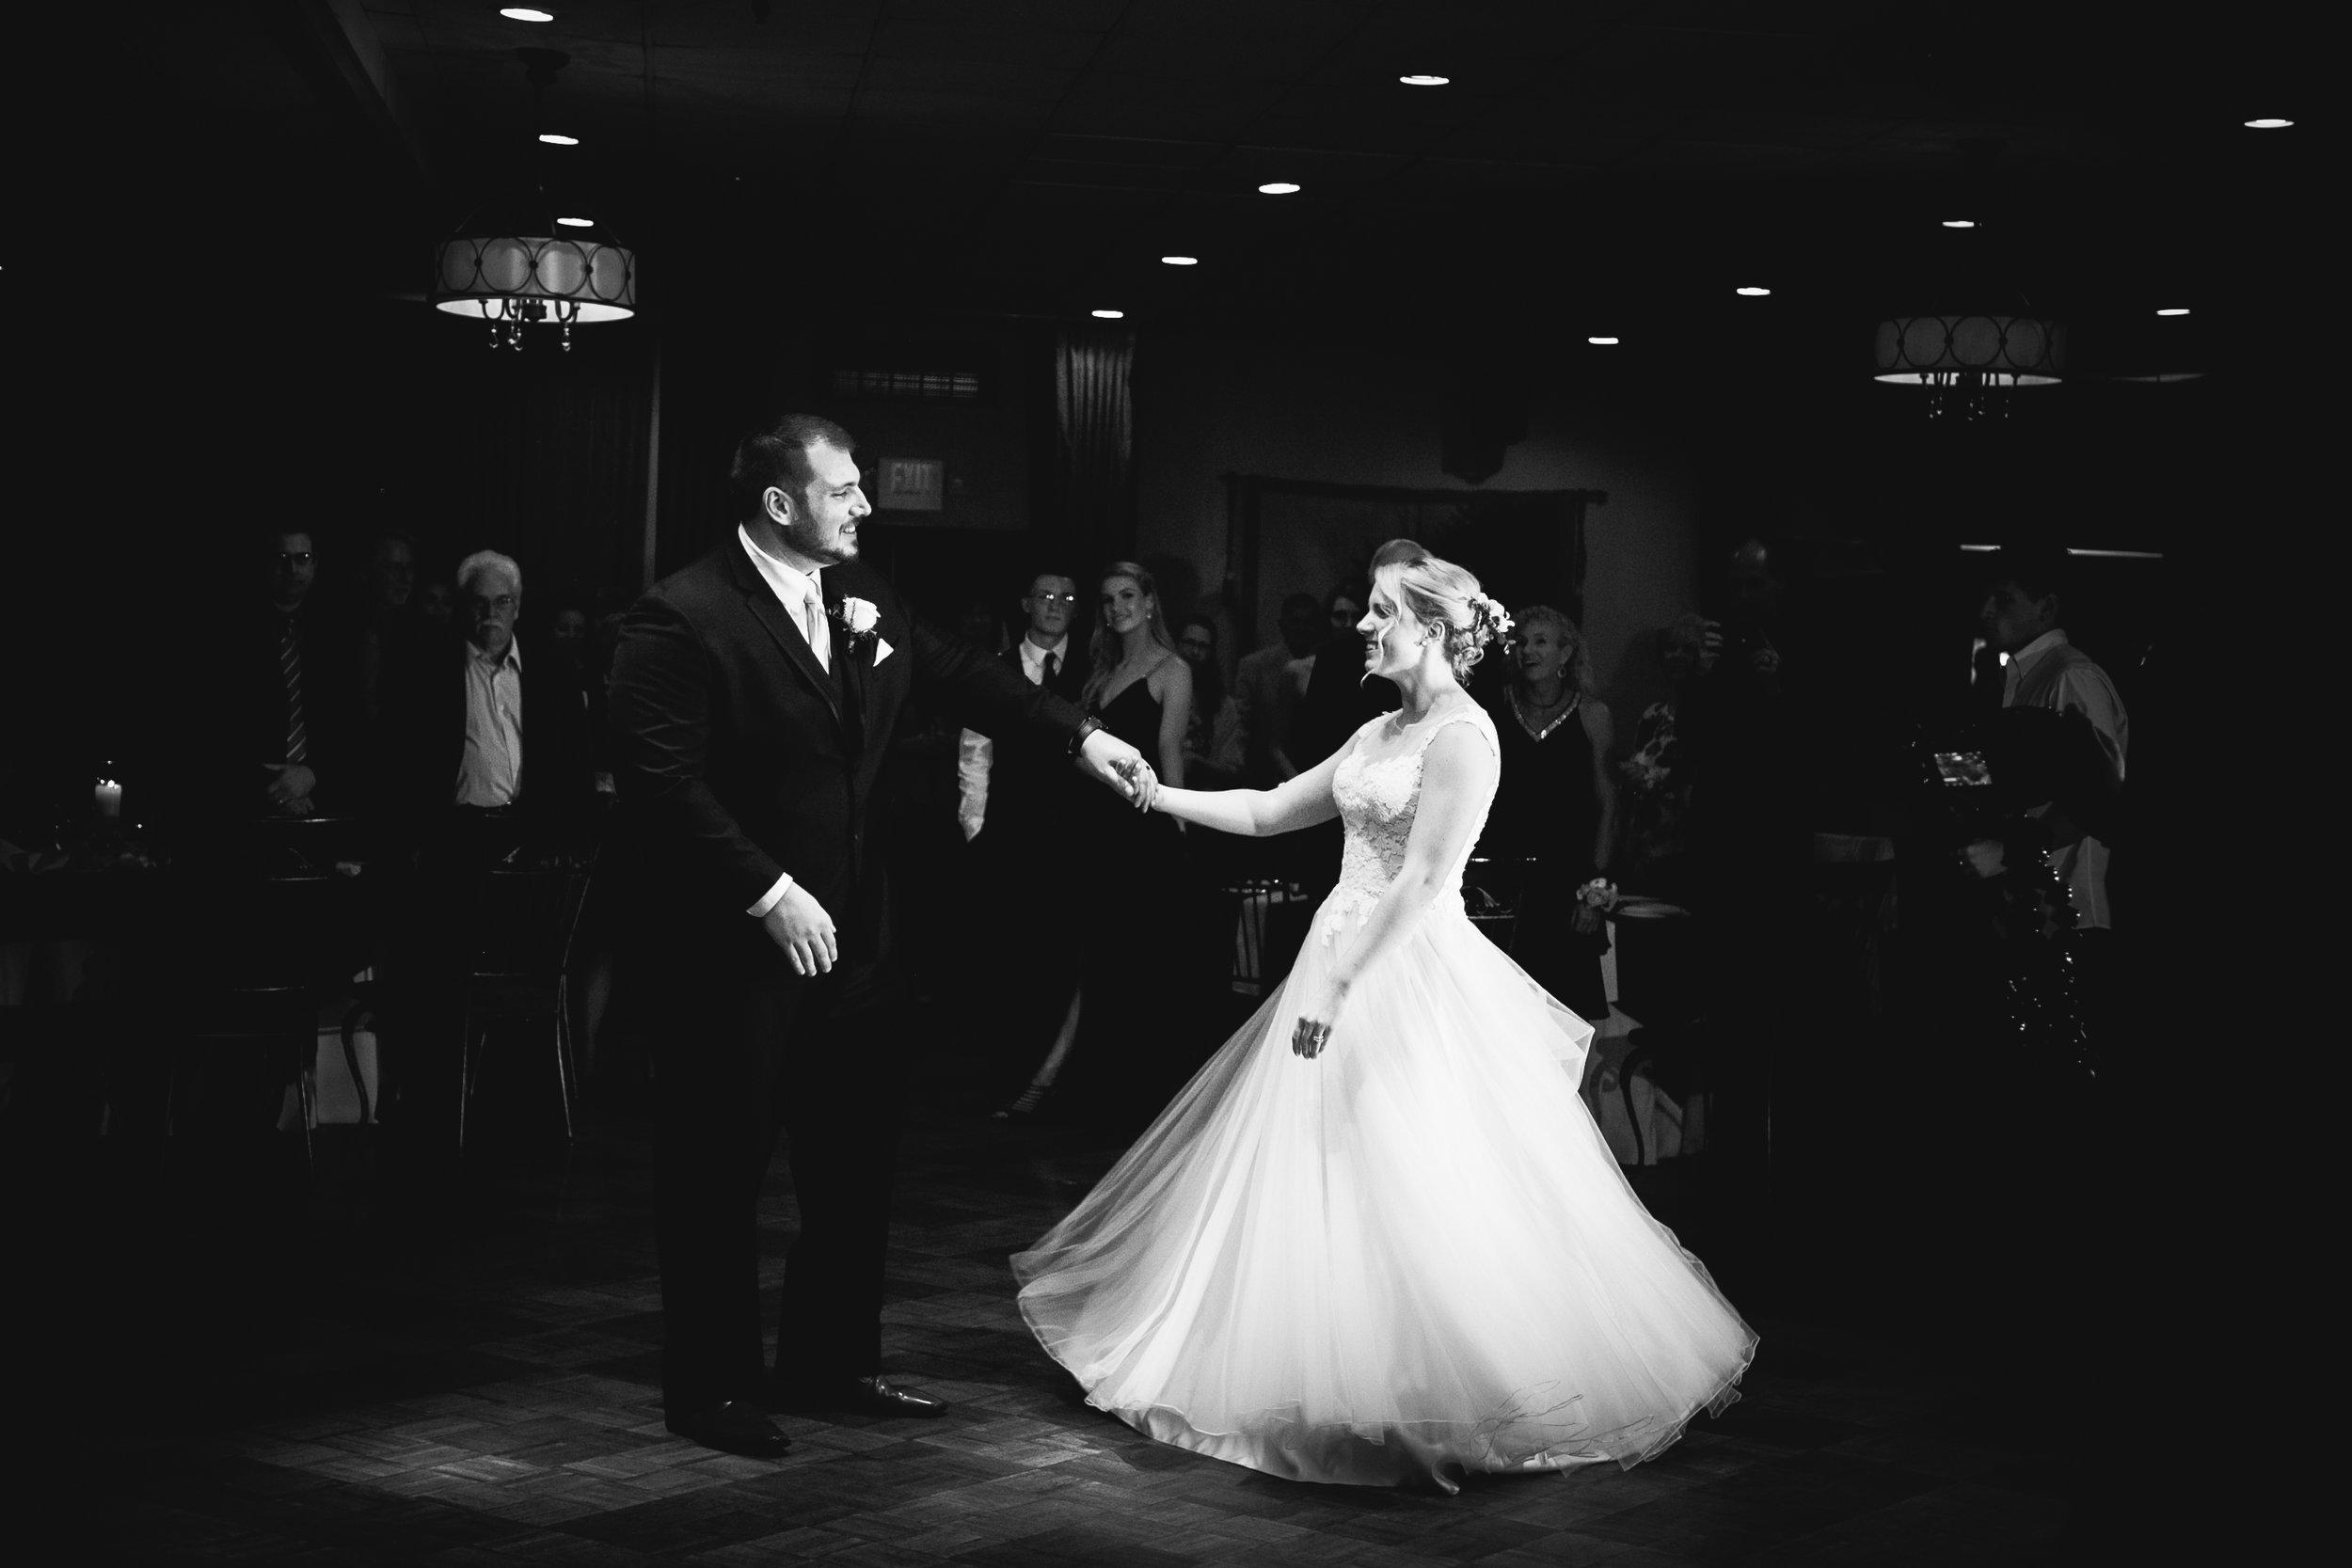 LA LUNA BANQUET HALL WEDDING BENSALEM - 093.jpg